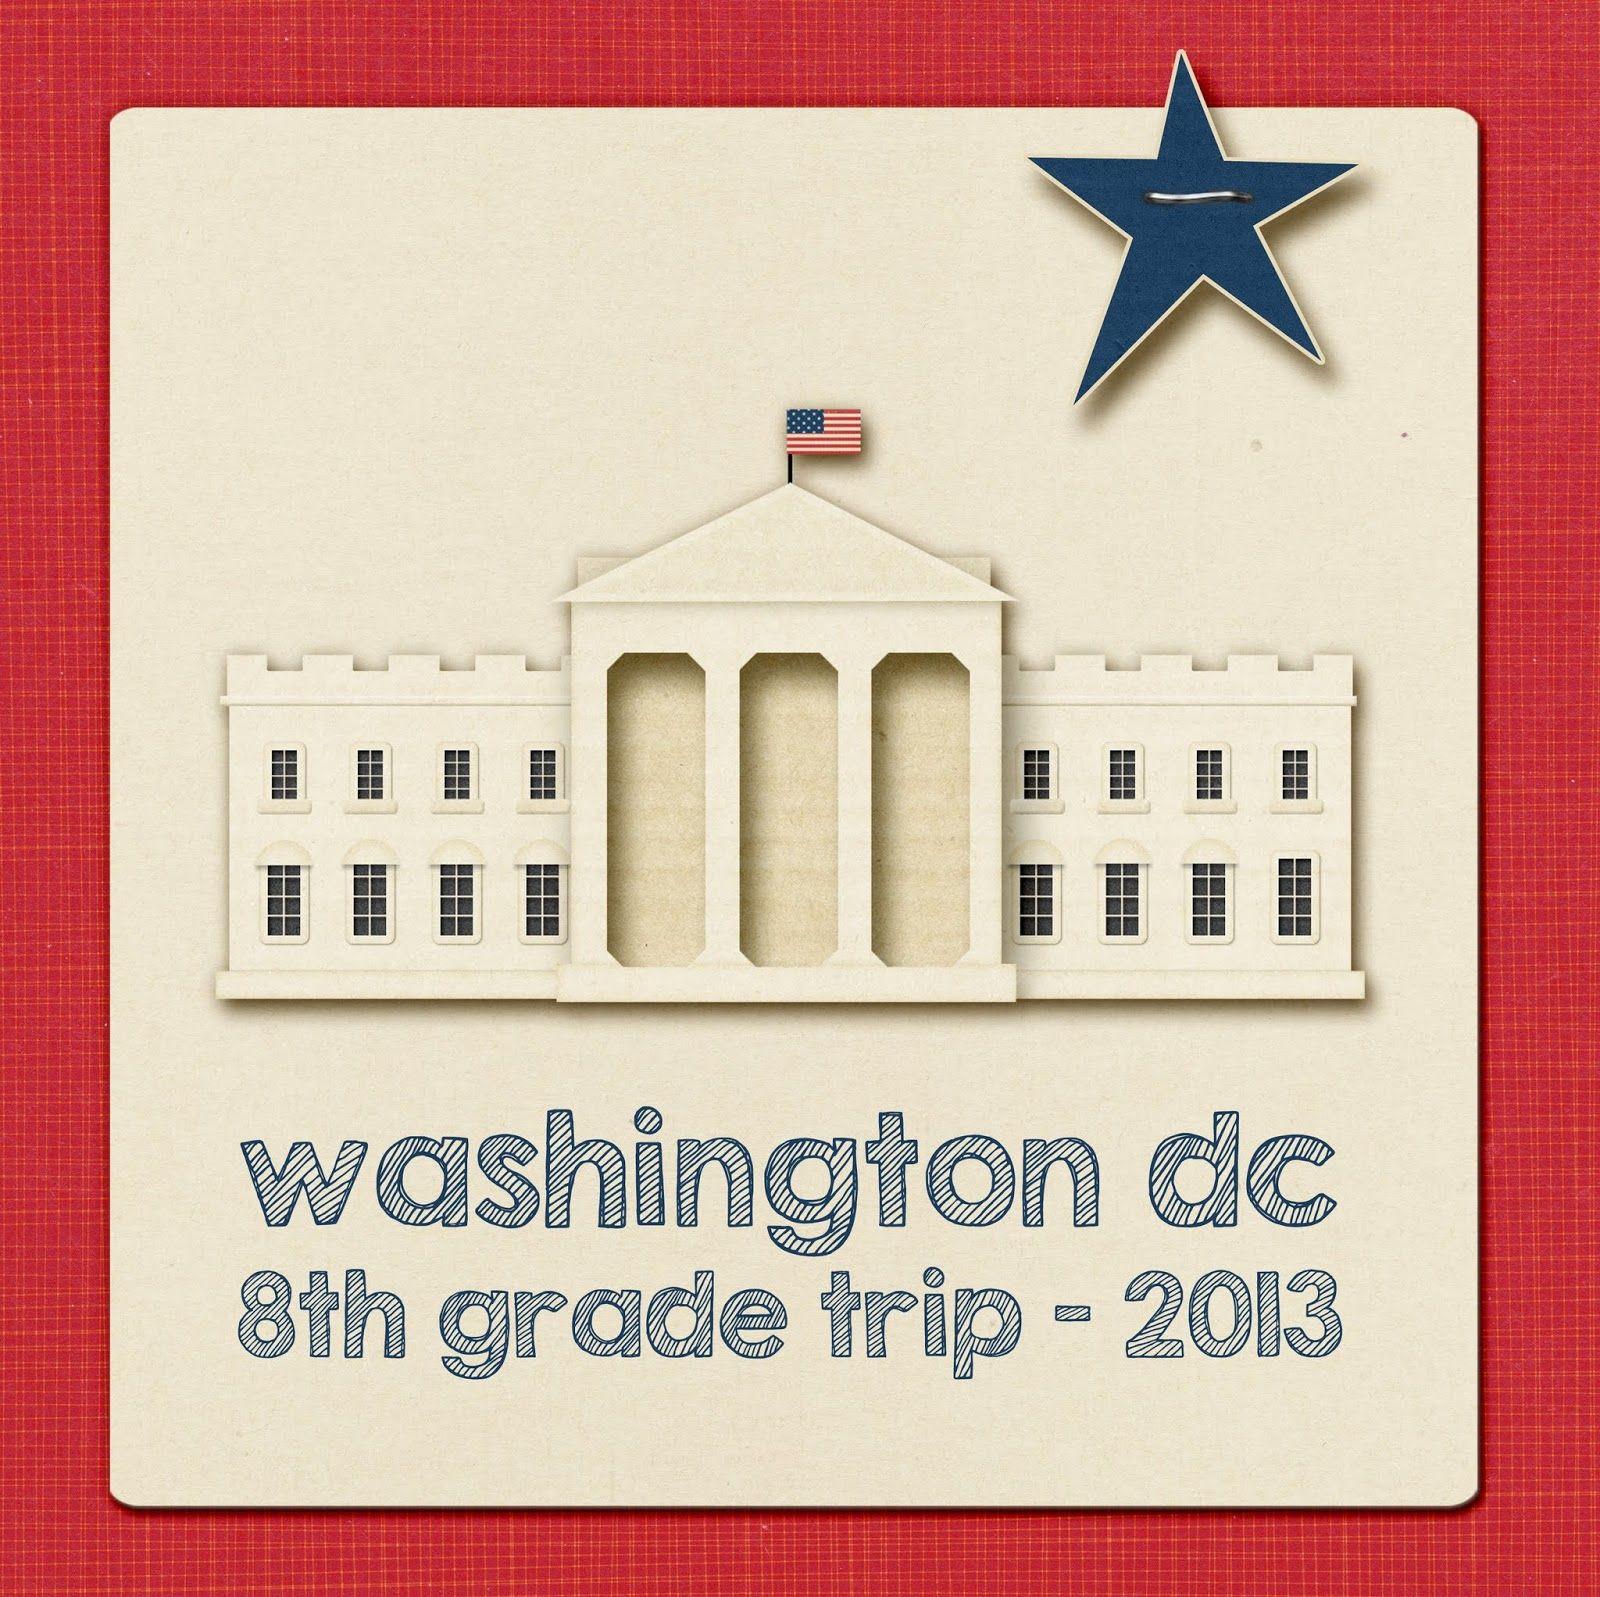 Washington Dc Tanners 8th Grade Trip Scrapbook Page Layouts